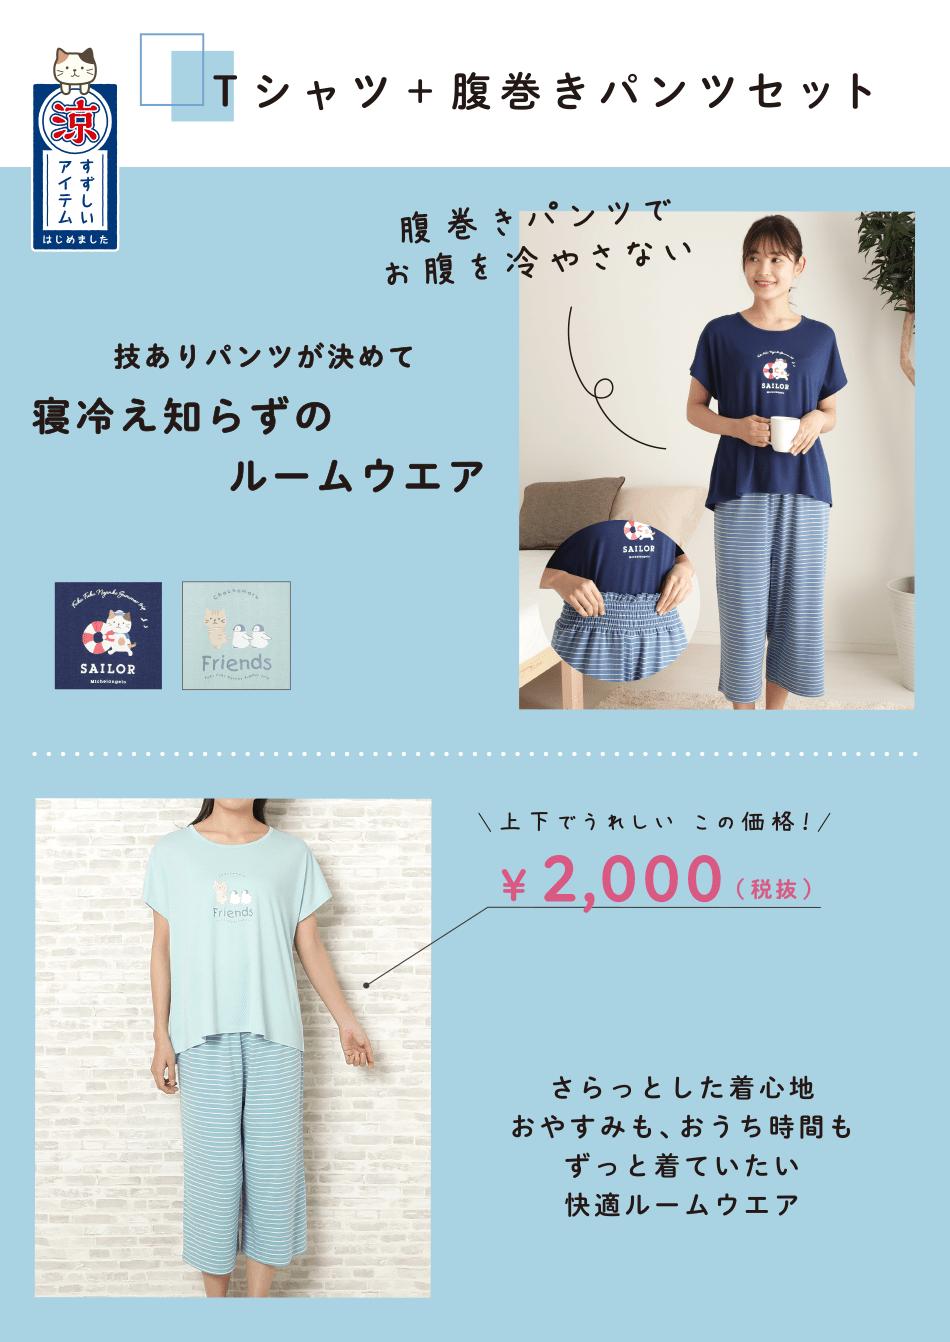 FukuFukuNyanko Tシャツ+腹巻き付きパンツセット